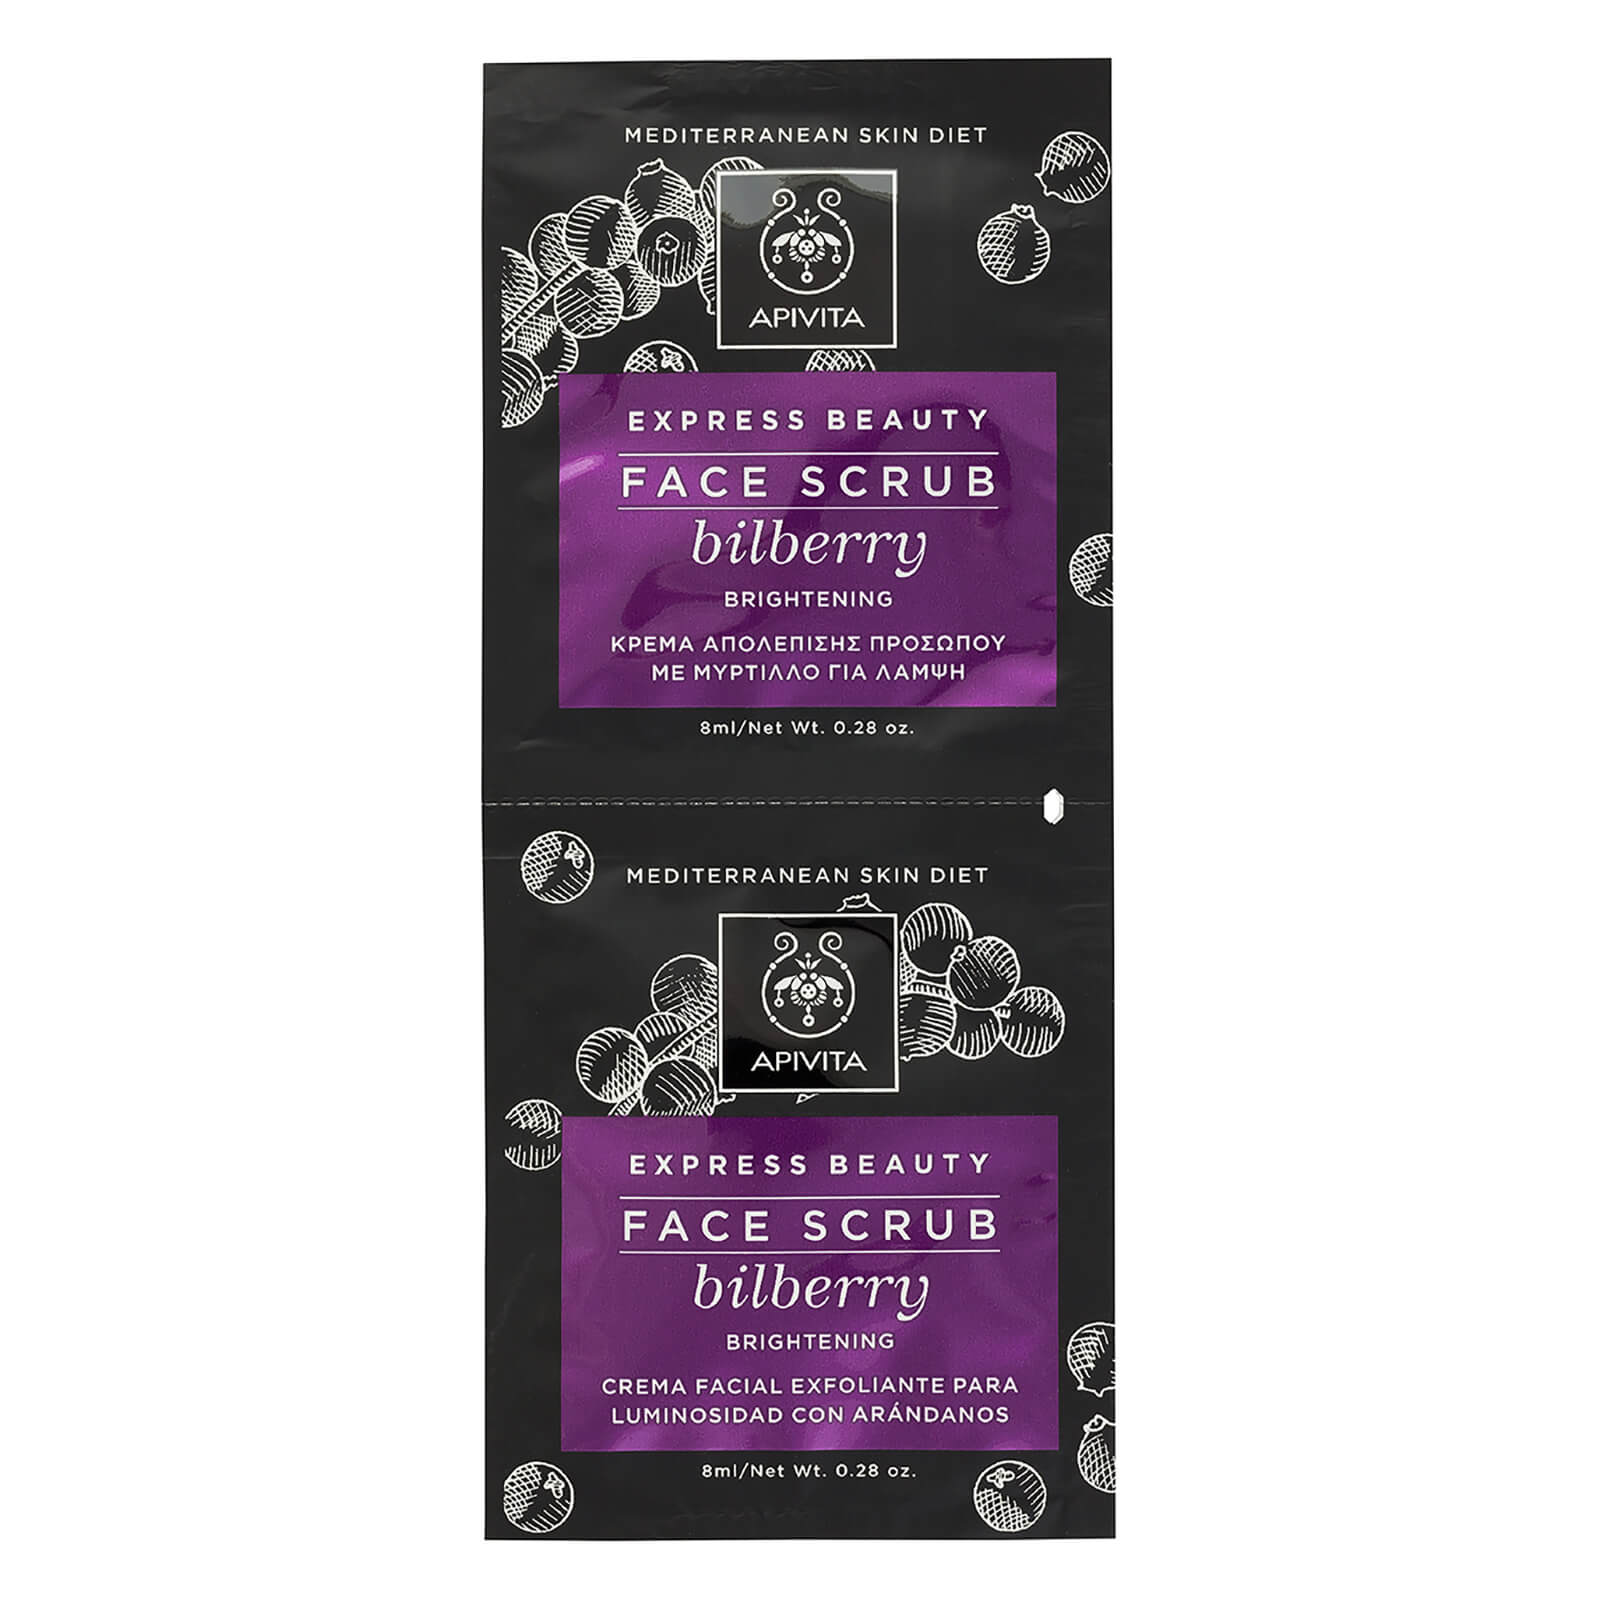 d7acbd7df20 https://bybeauty.com.ua/product/histoires-de-parfums-1828-jules ...